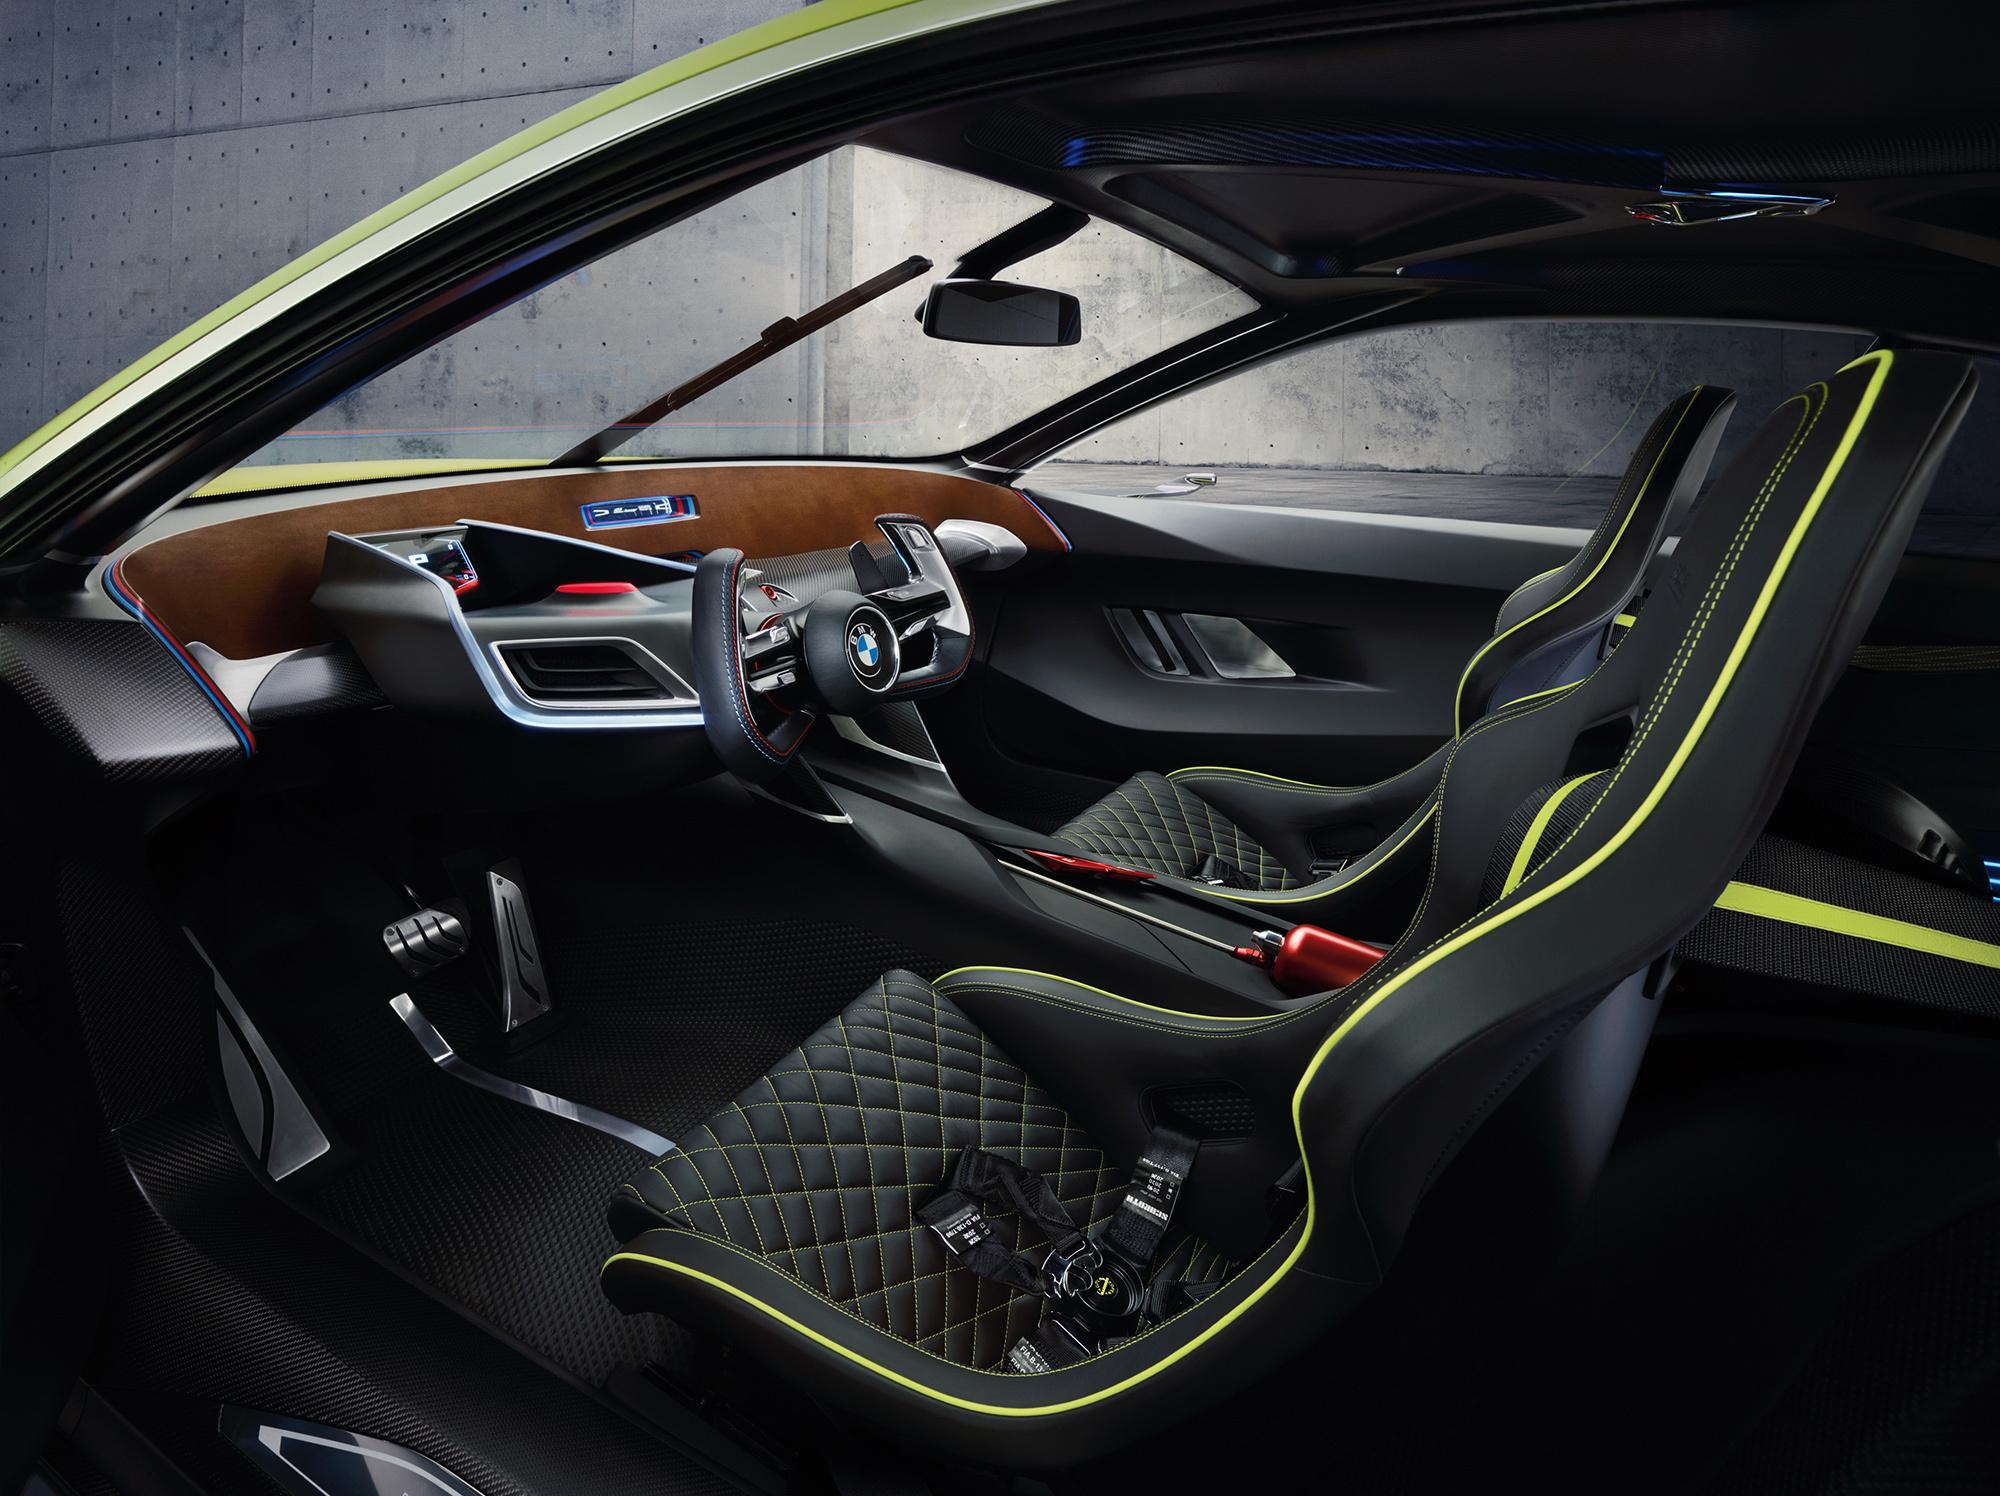 BMW 3.0 CSL Hommage Concept Background